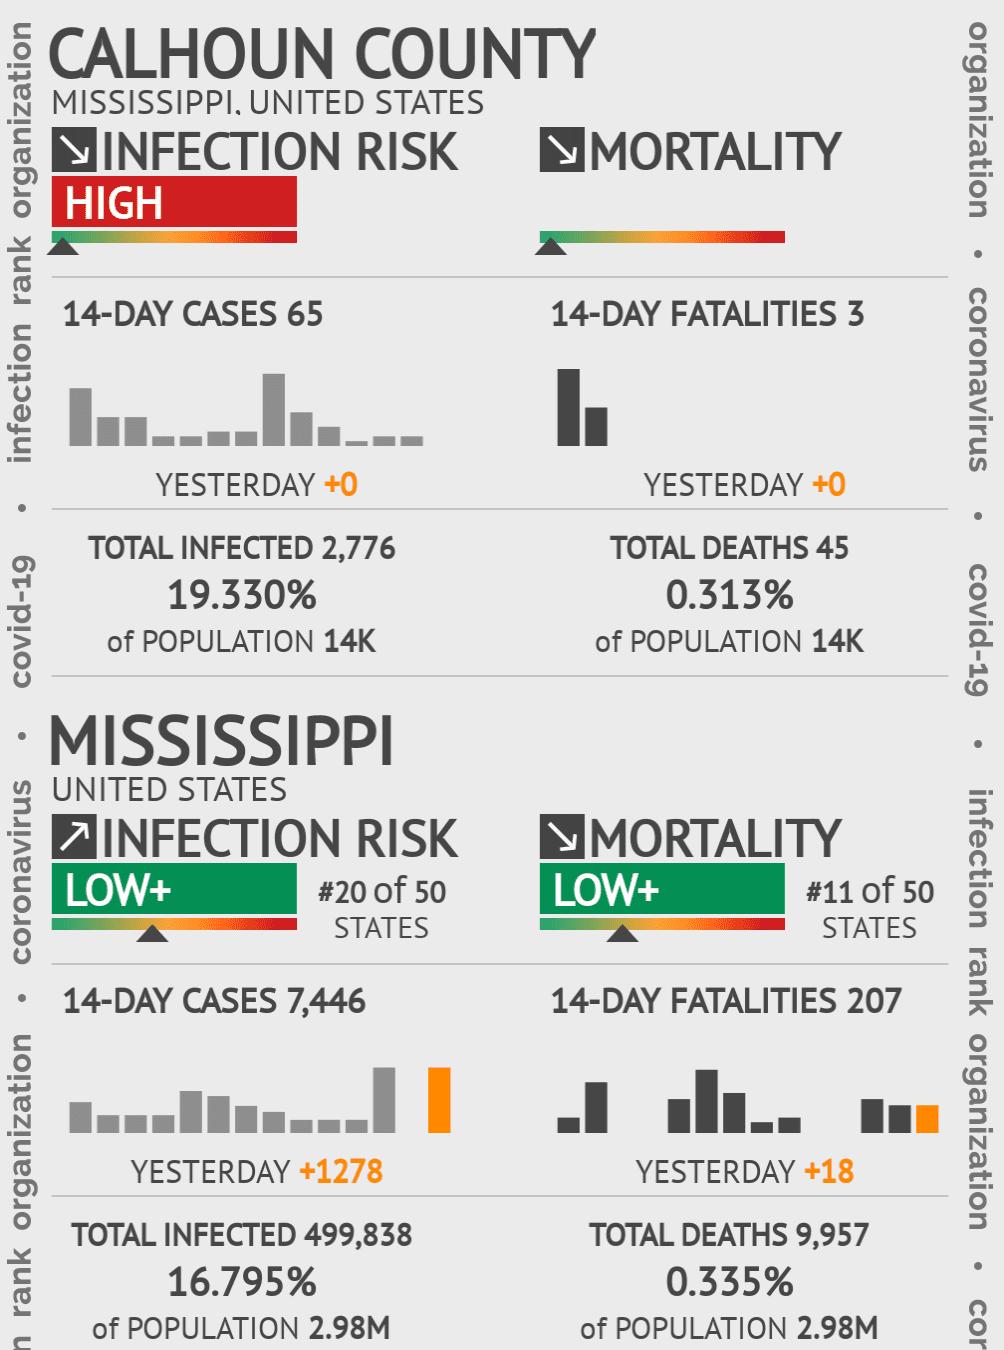 Calhoun County Coronavirus Covid-19 Risk of Infection on February 26, 2021